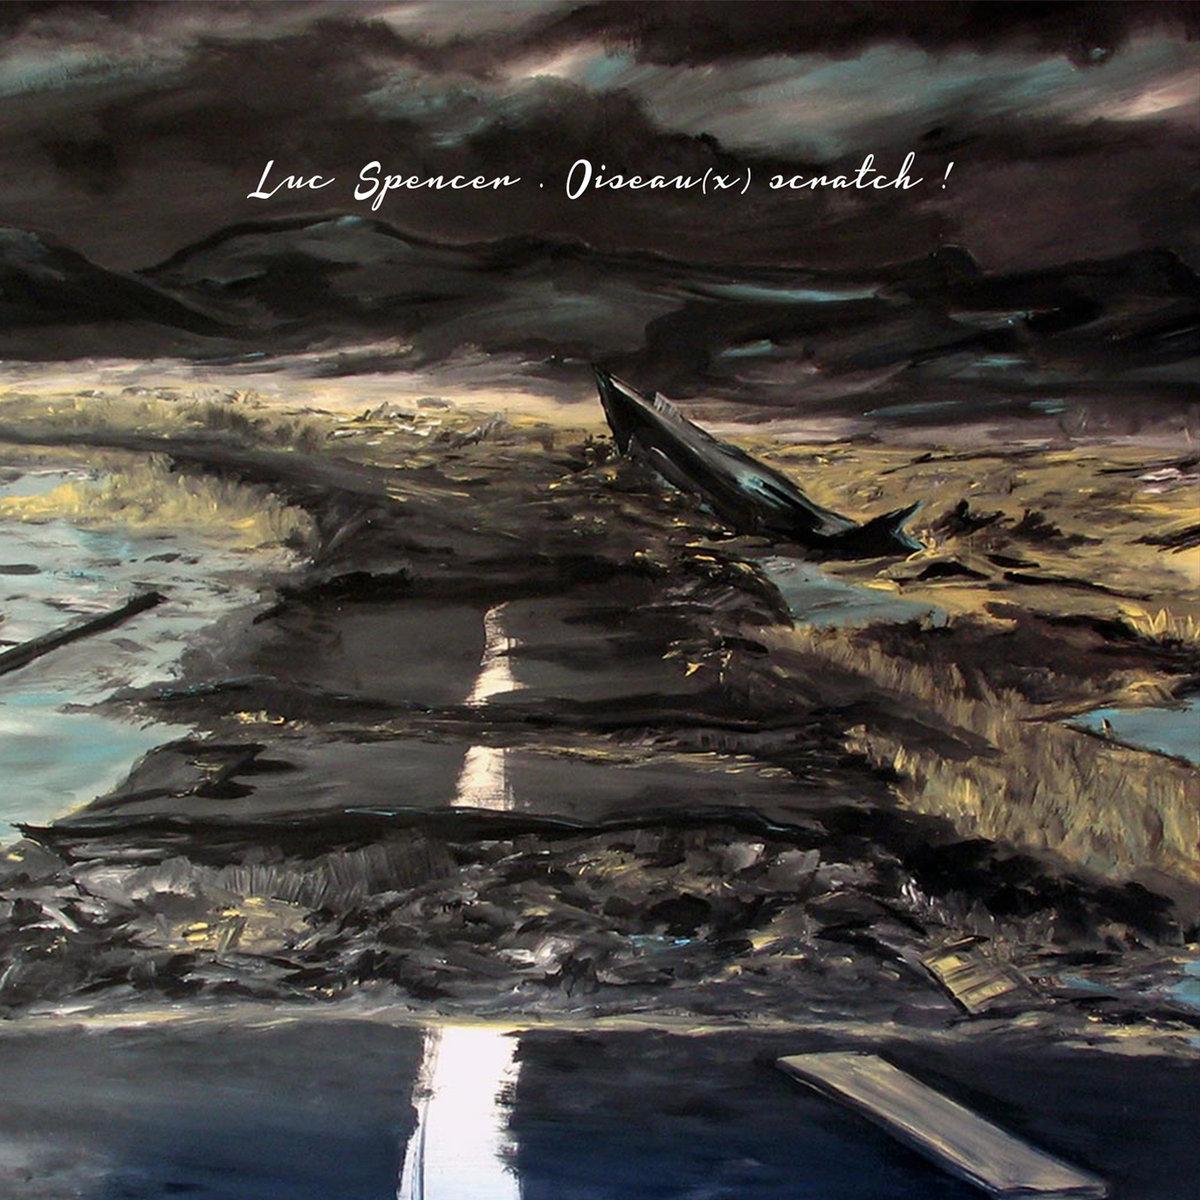 Luc Spencer – Oiseau(X) Scratch